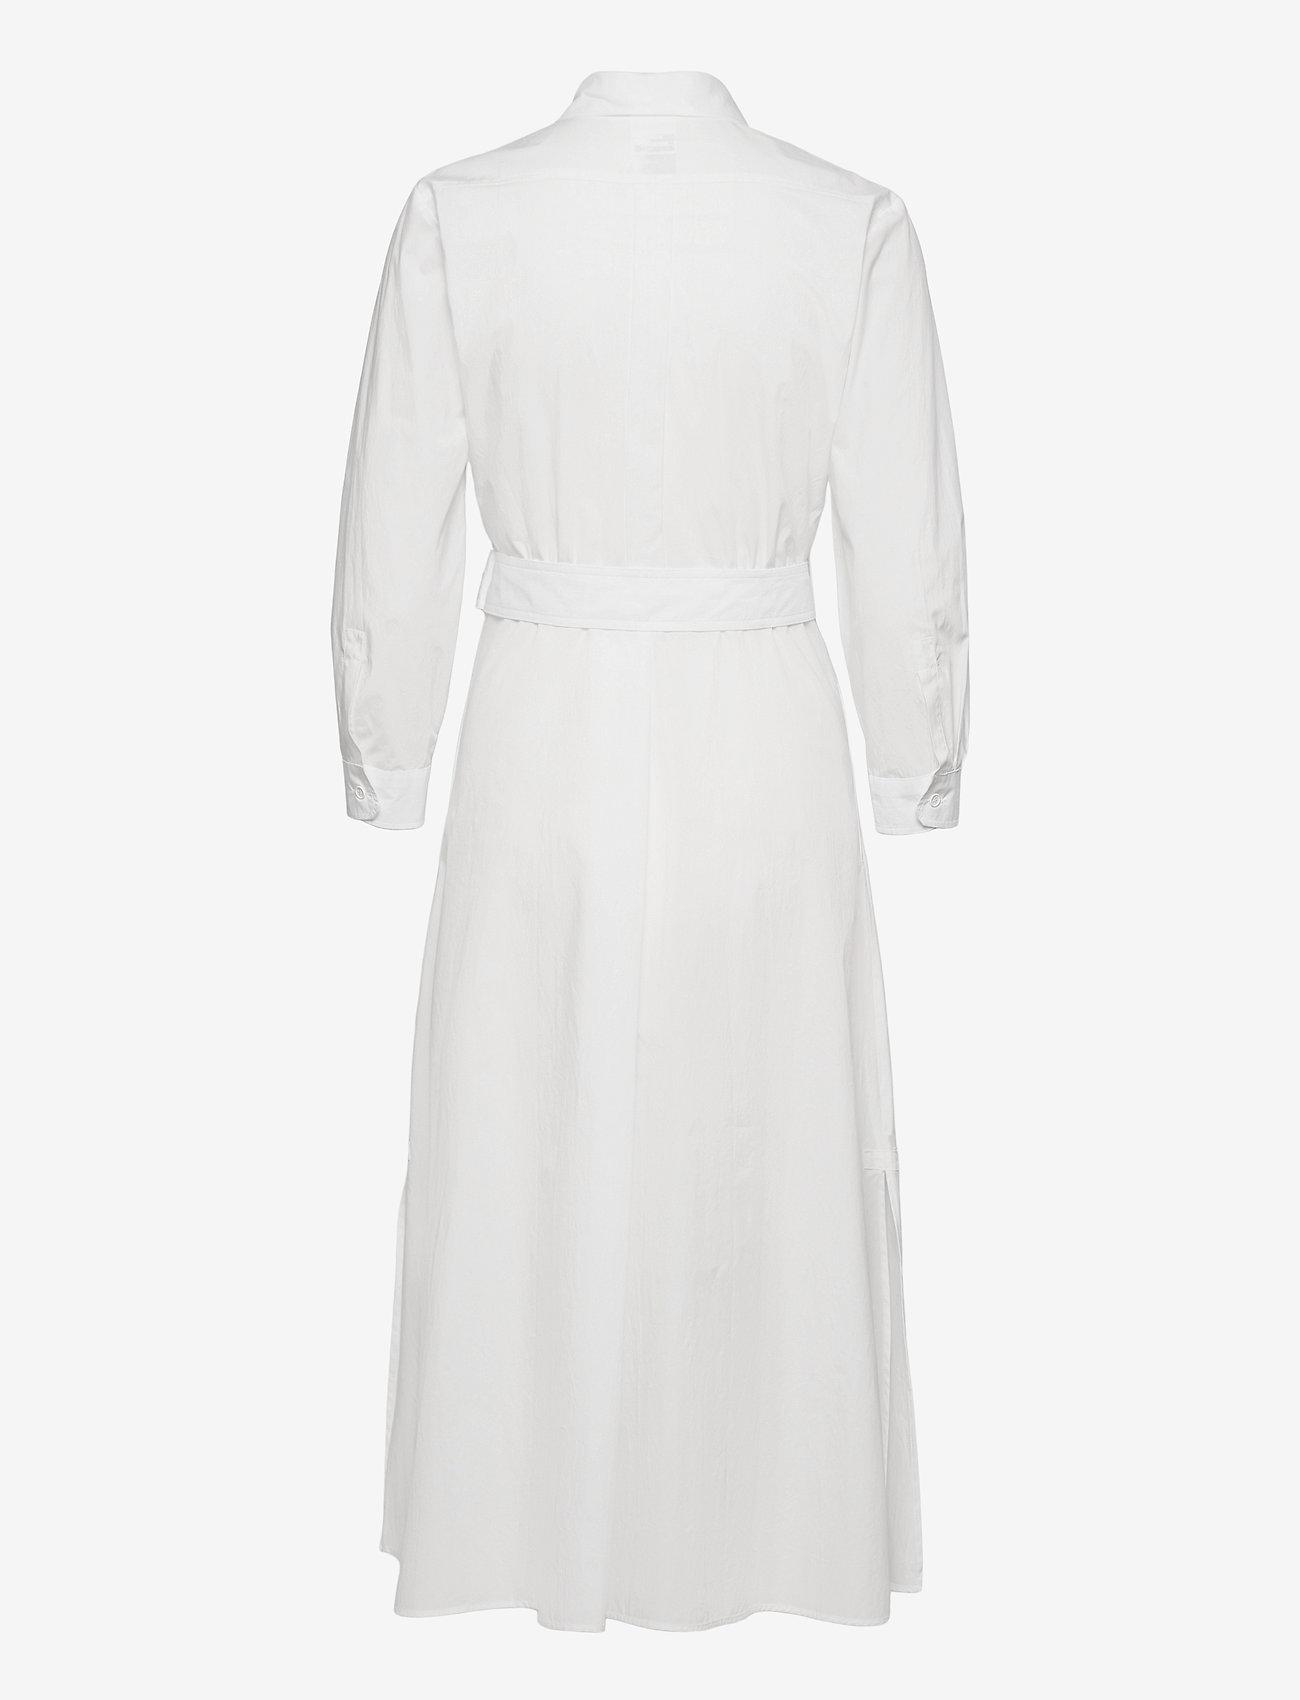 Weekend Max Mara - FAVILLA - maxi dresses - white - 1